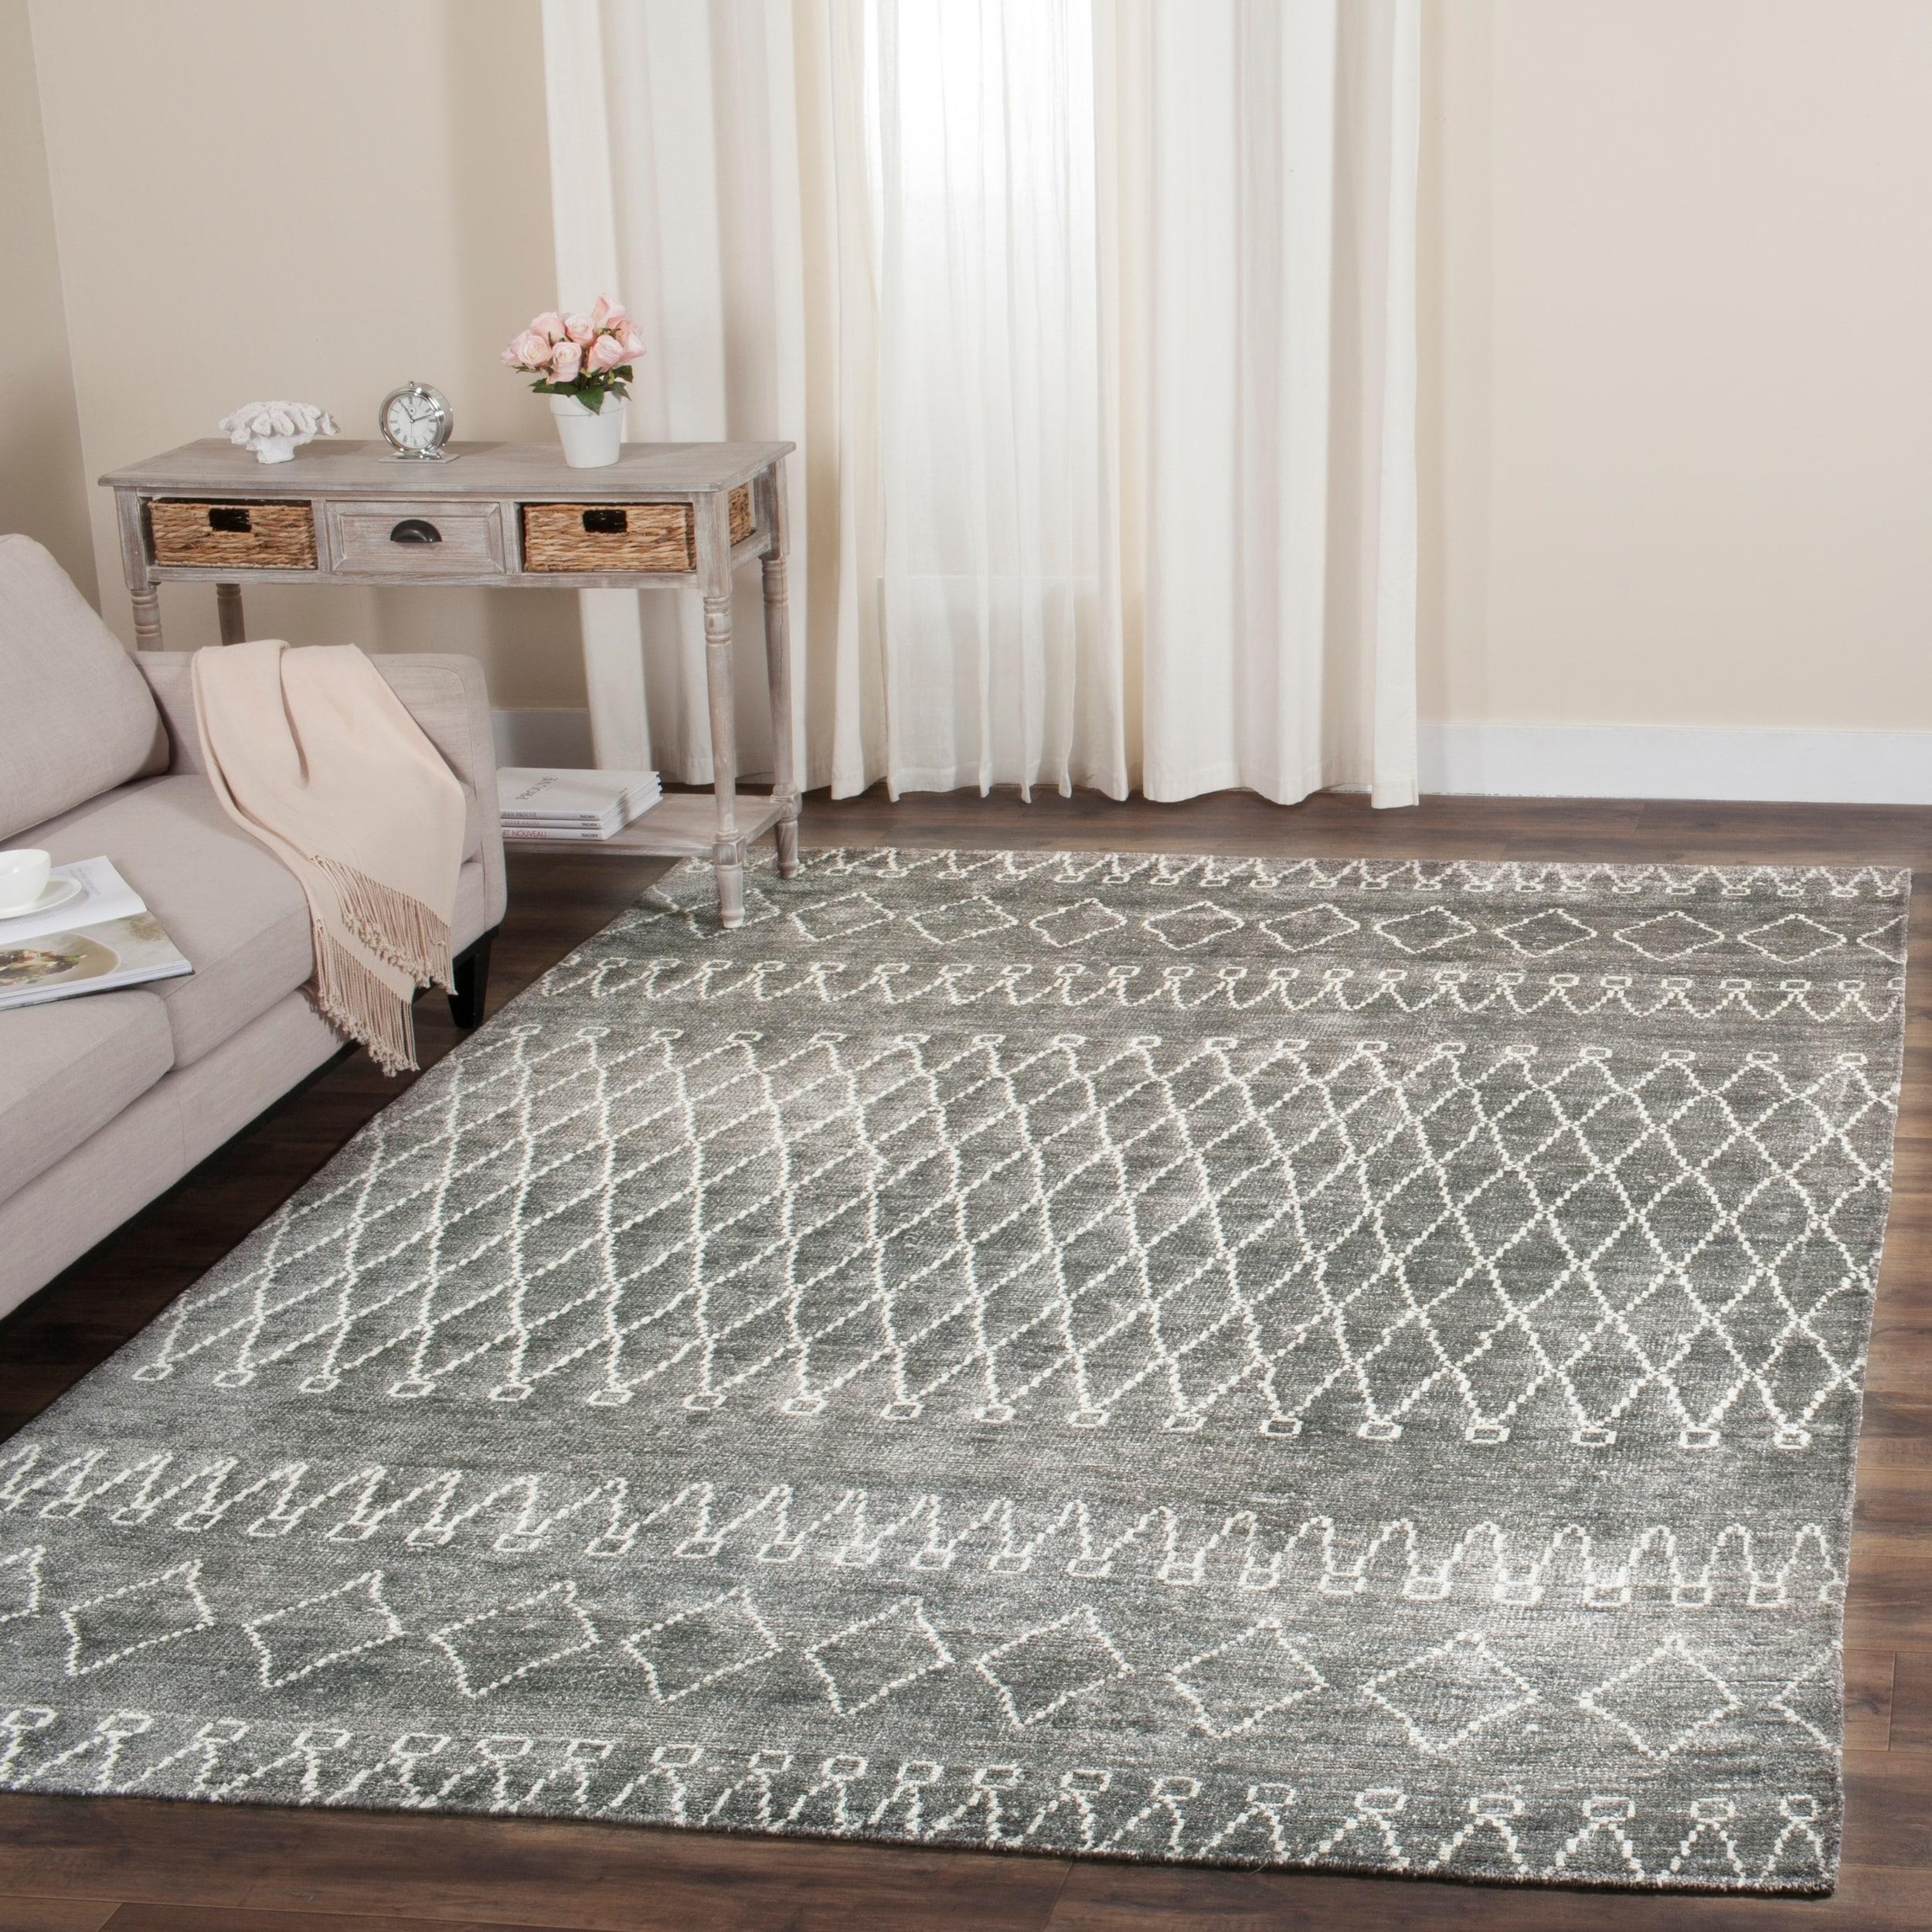 Safavieh hand knotted stone wash traditional oriental grey beige viscose rug 9 x 12